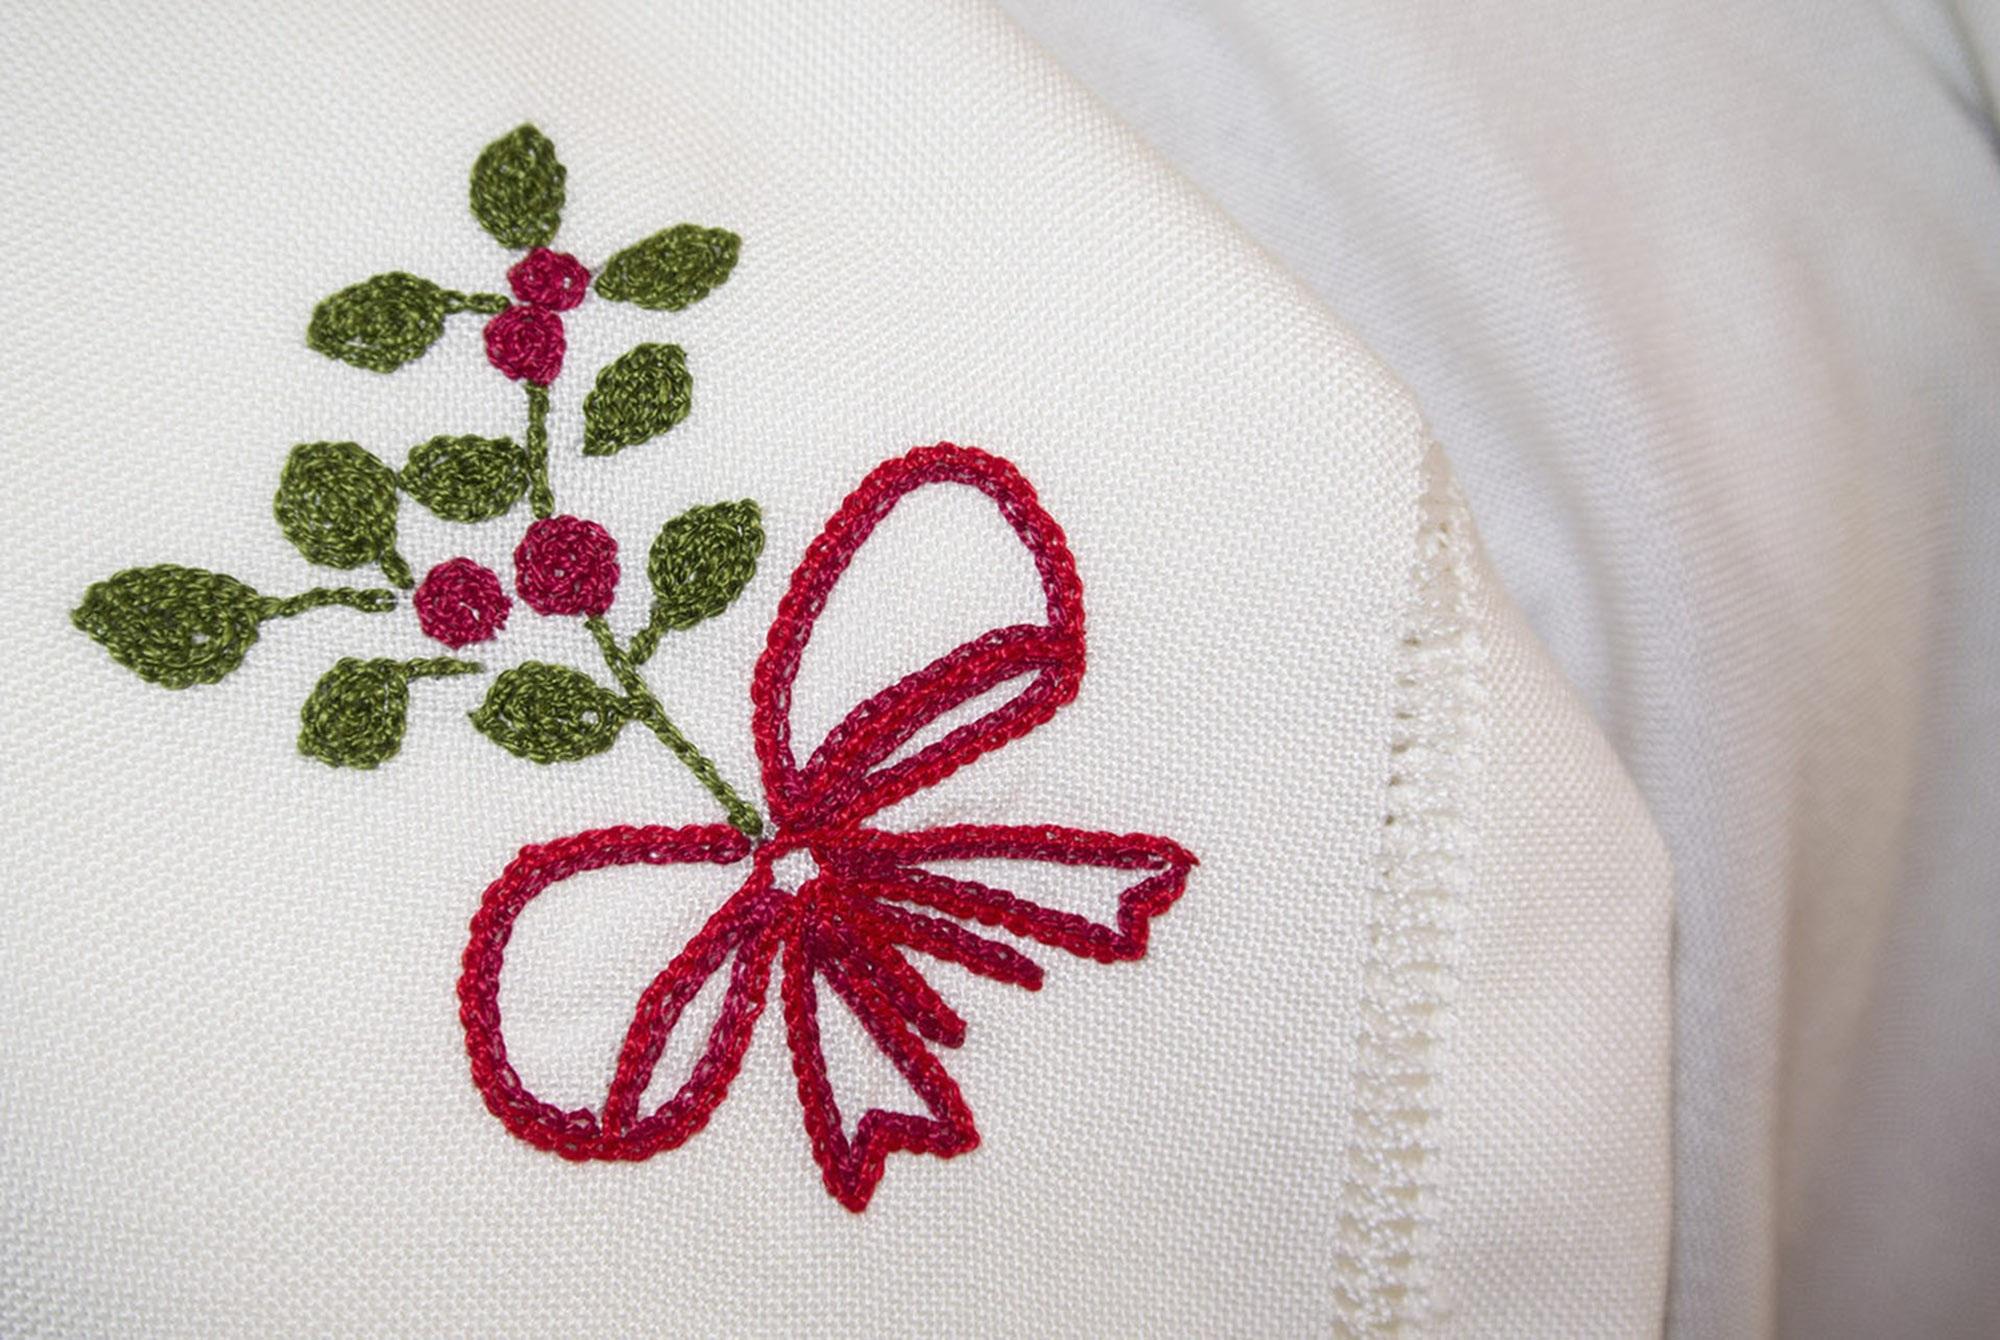 Fotos gratis : flor, pétalo, patrón, ropa, material, de coser ...